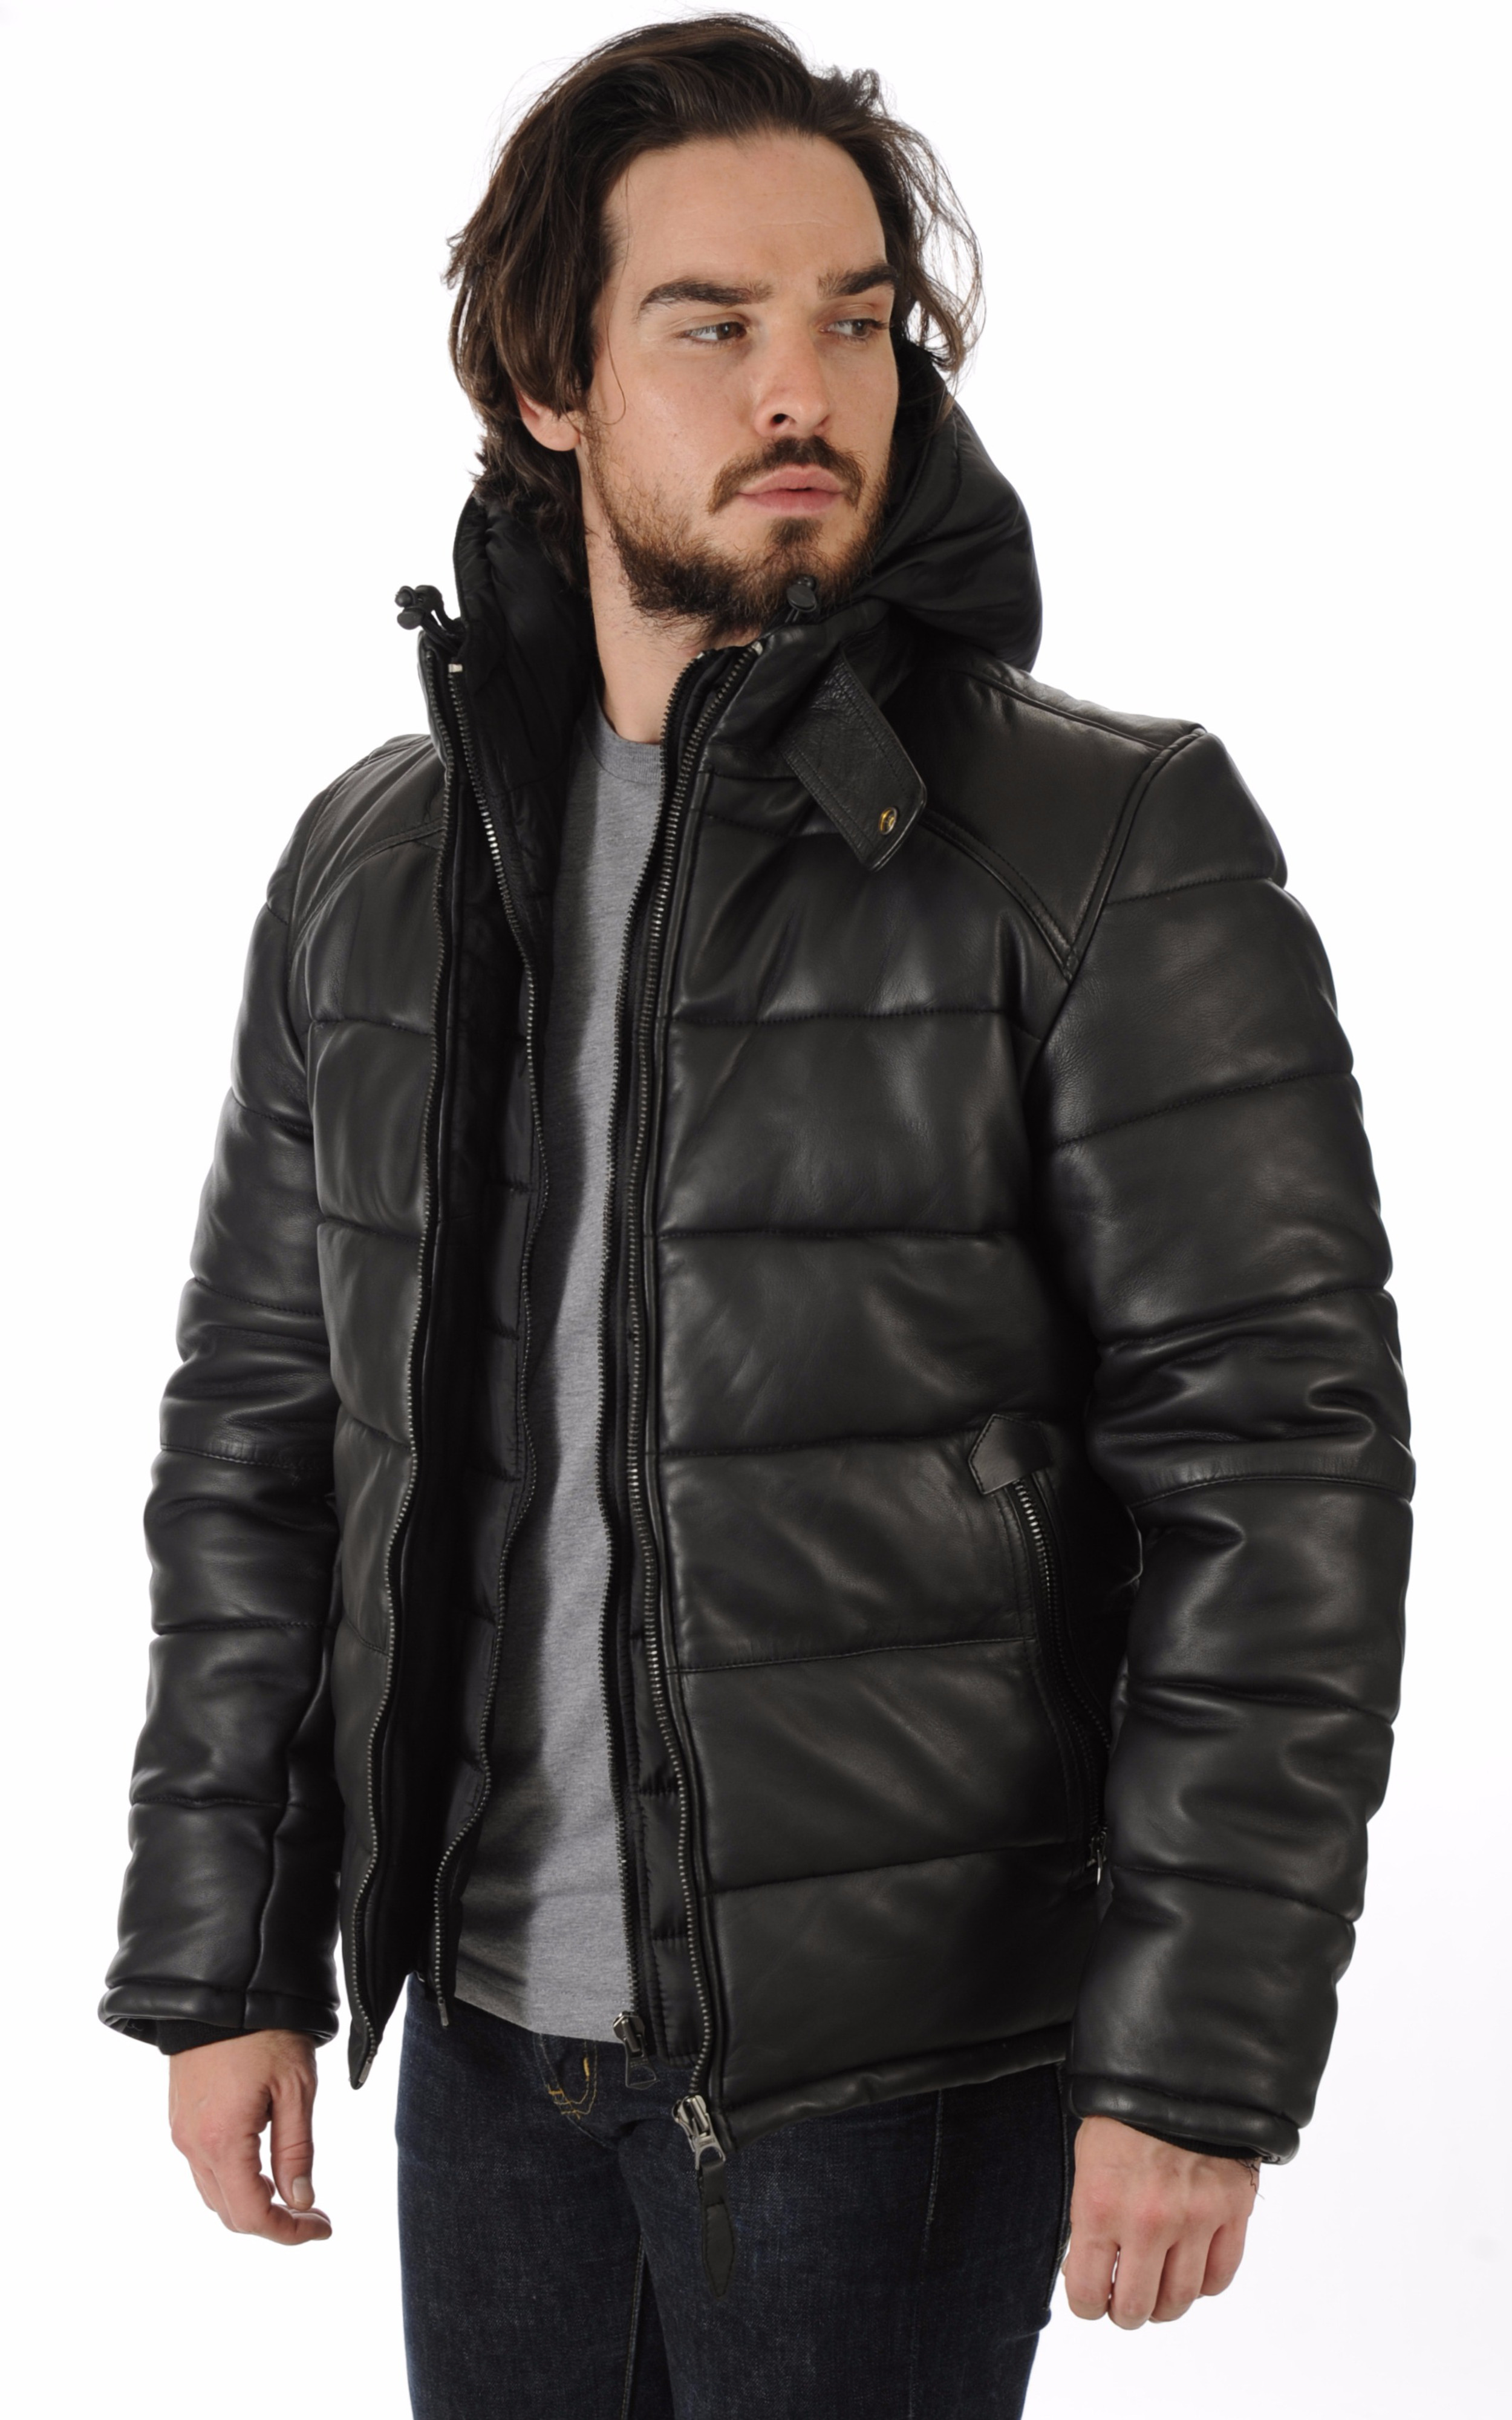 Doudoune en cuir noir lc6000 schott la canadienne doudoune parka cuir noir - Verlicht en cuir noir ...